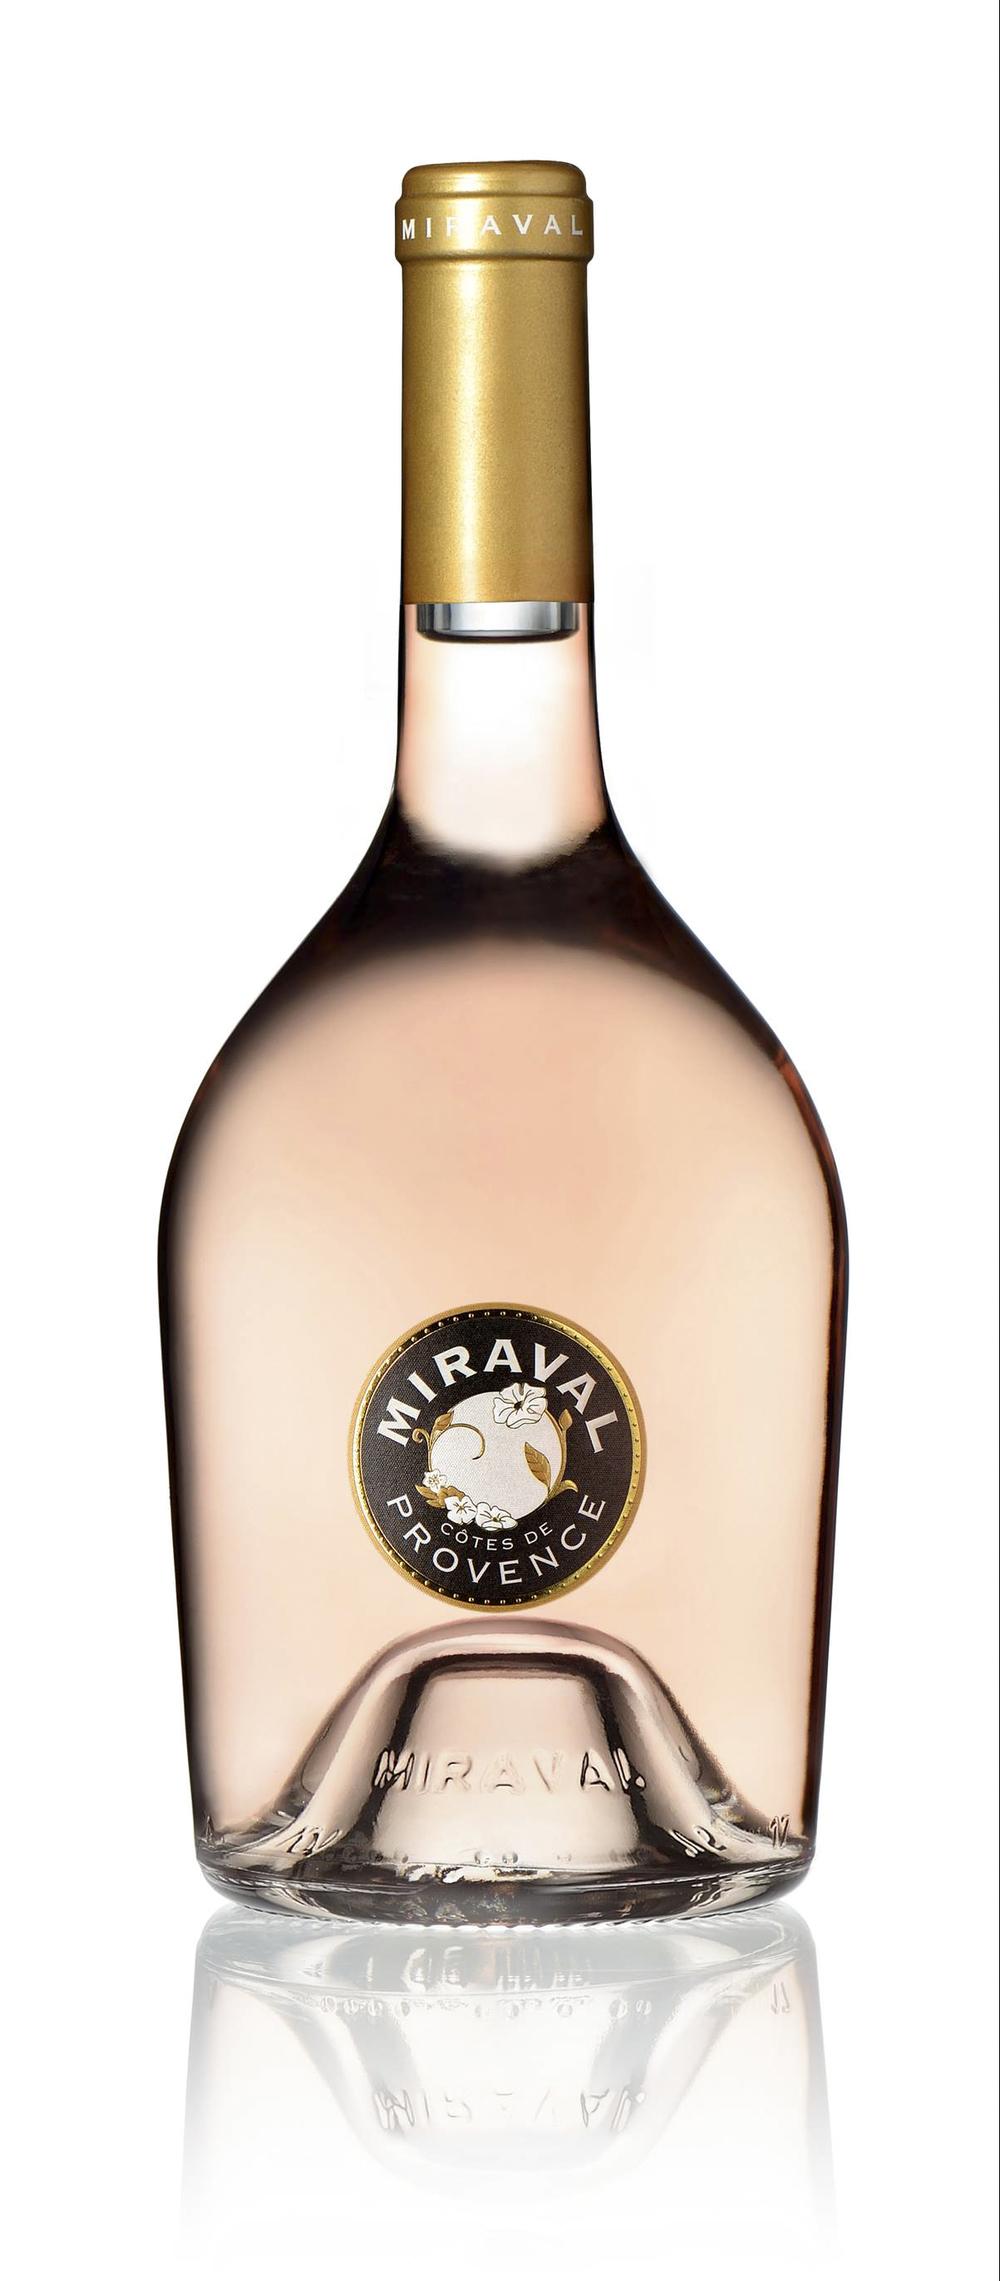 Perrin Miraval Côtes de Provence Rosé Bottle_with reflection.jpg